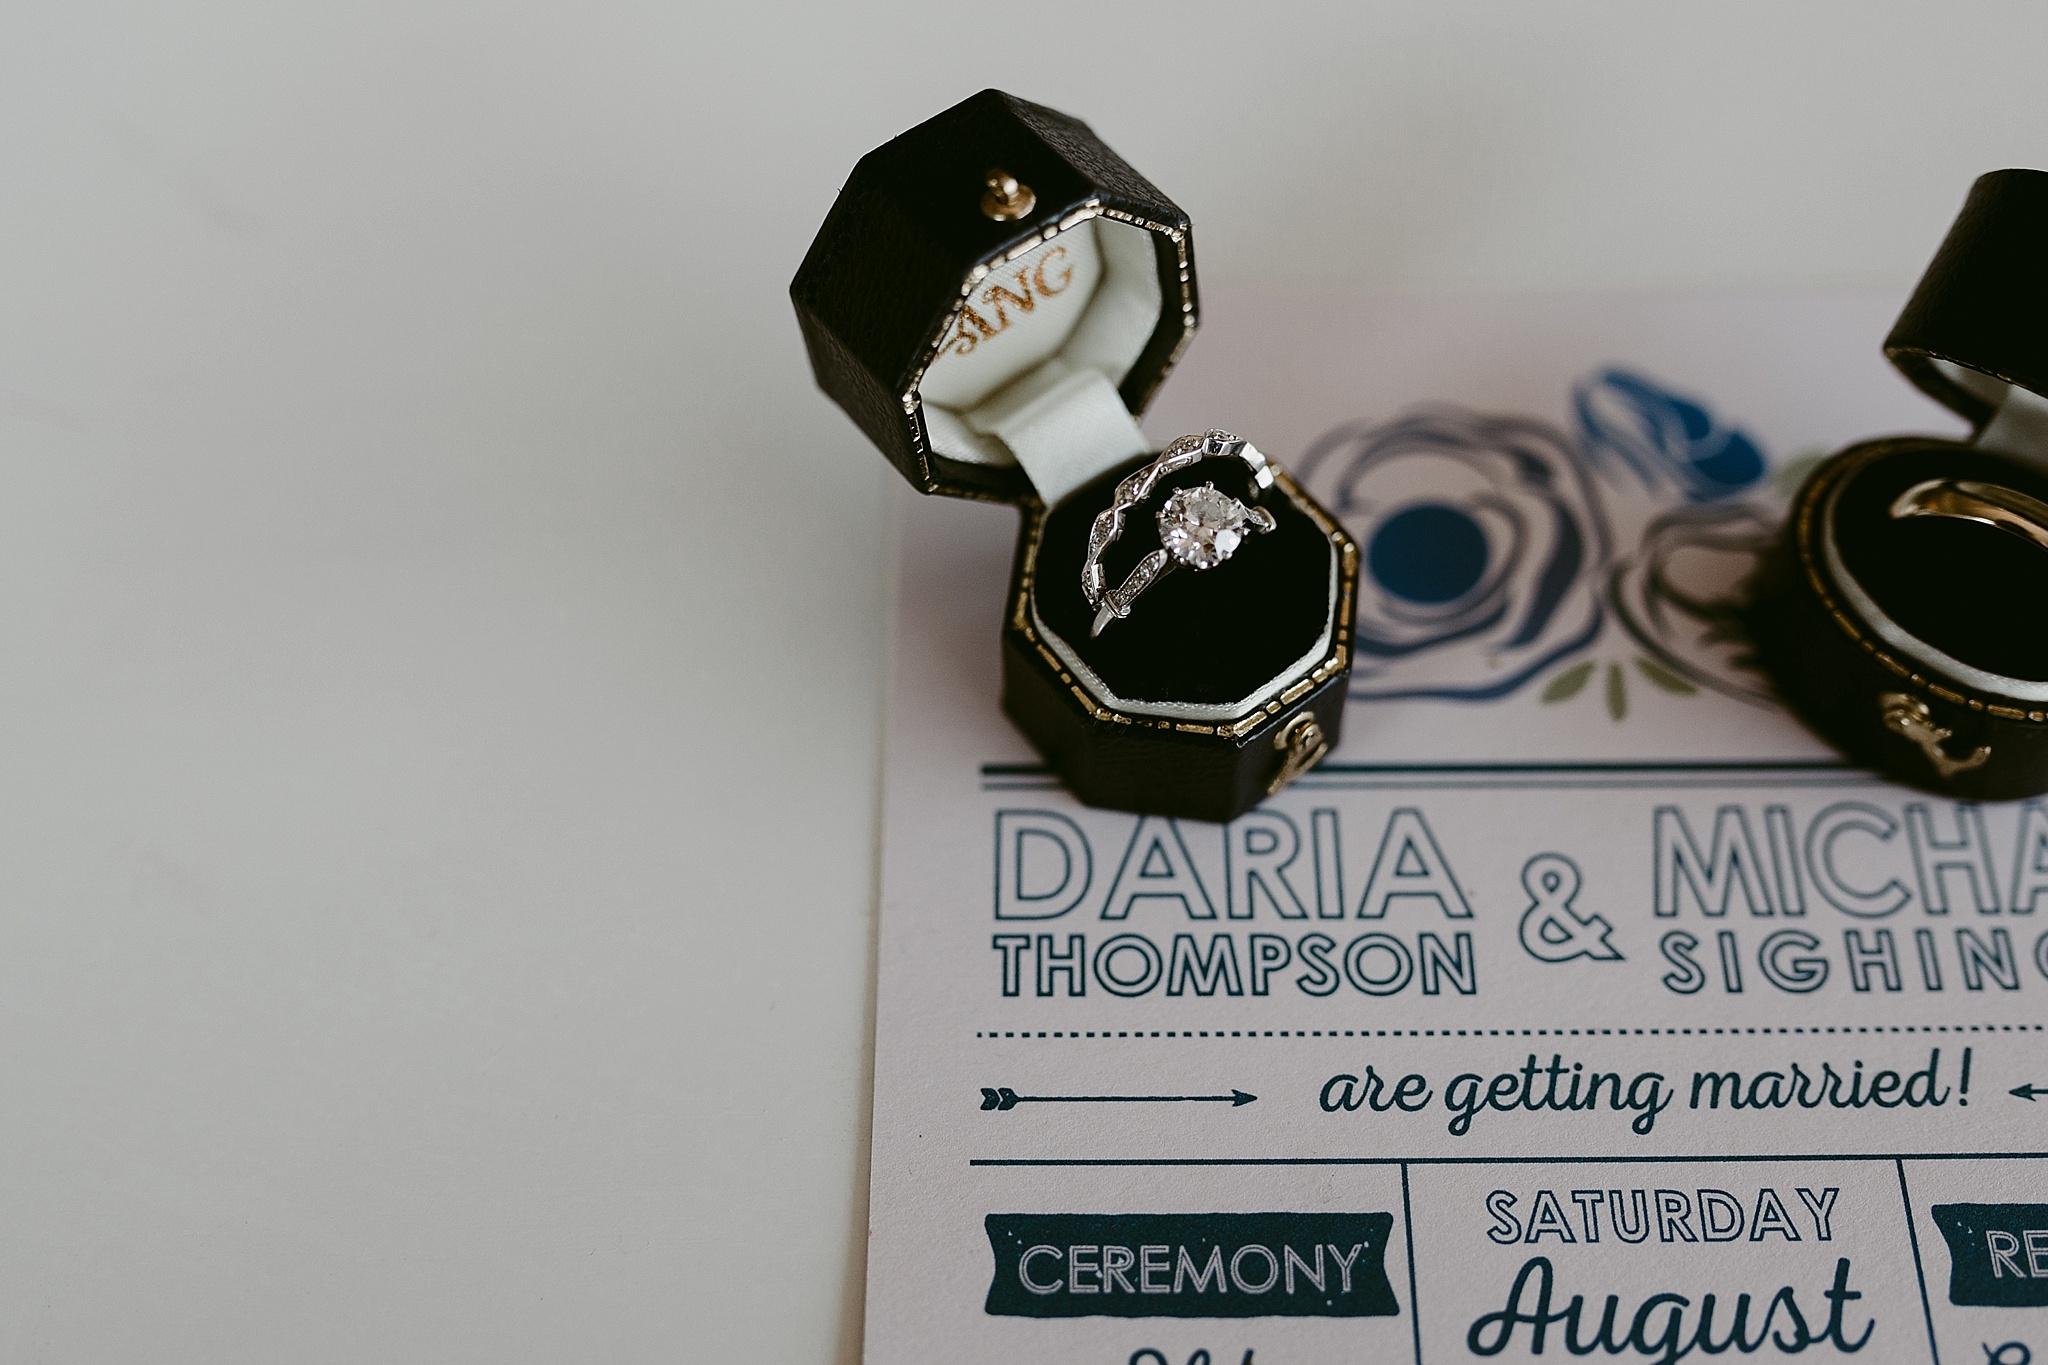 SF Wedding Photographers - Northern California wedding photographers - The Allens Photography